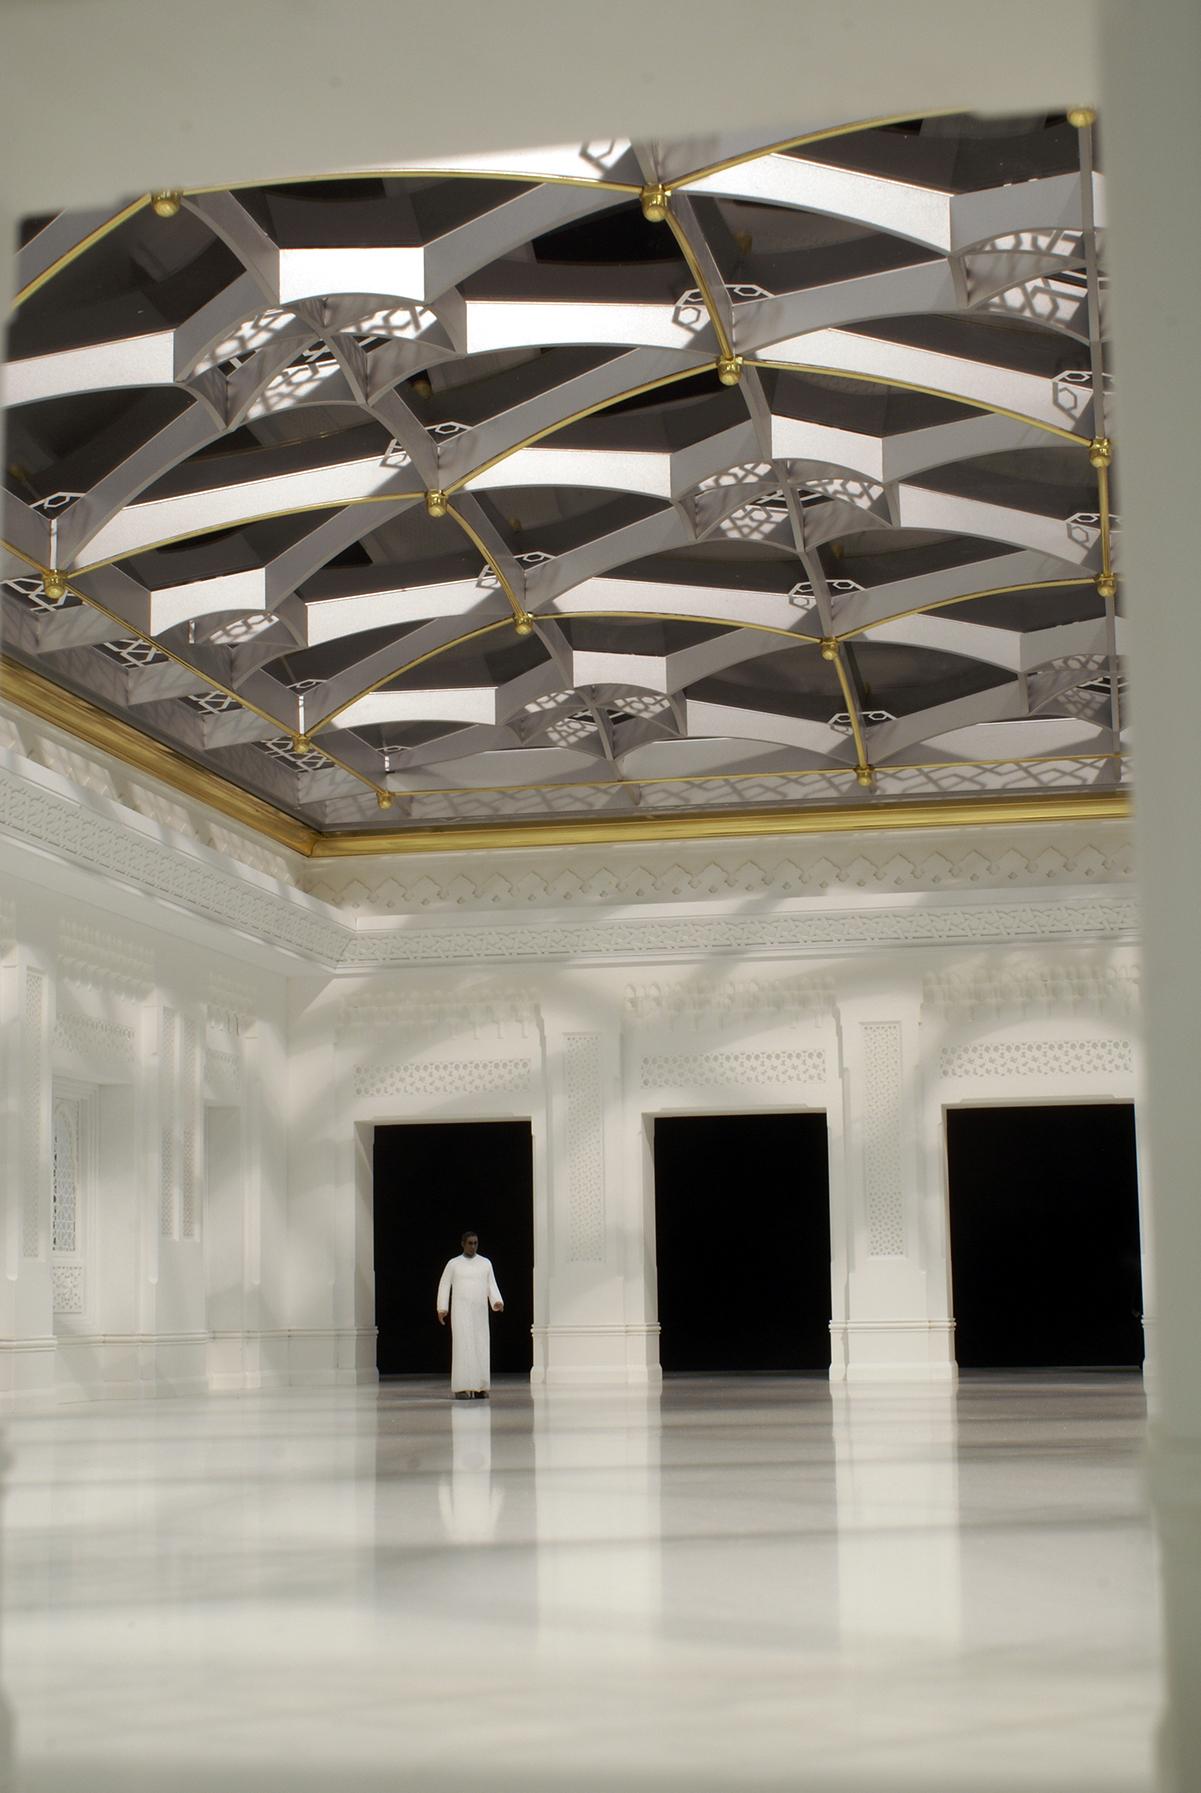 Moschee Mekka M 1:50, RIVA